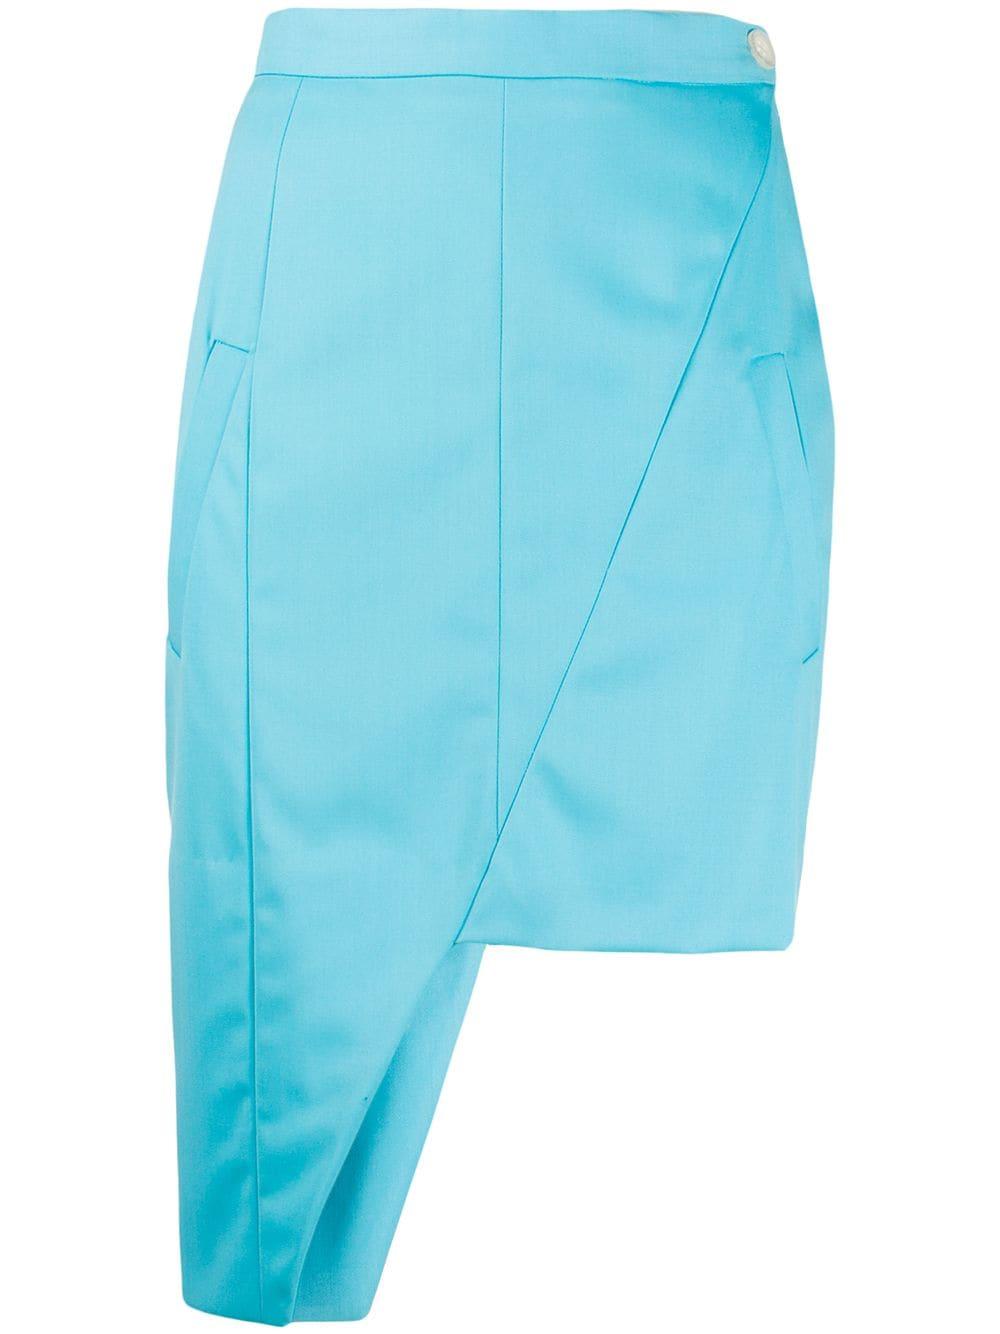 Natasha Zinko юбка асимметричного кроя со вставками